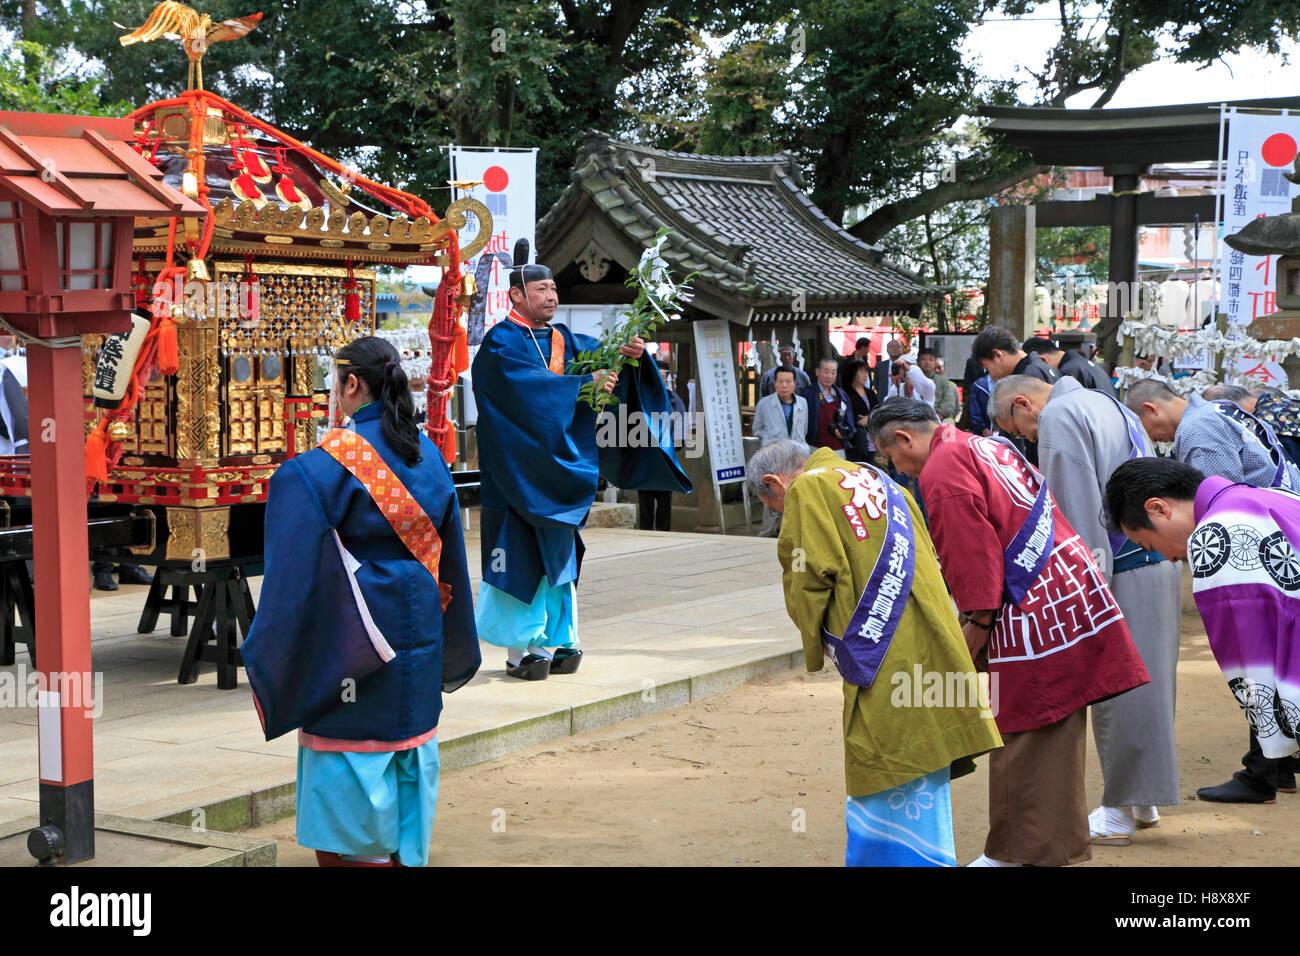 Japan, Sakura City, festival, shinto priest blessing people, - Stock Image